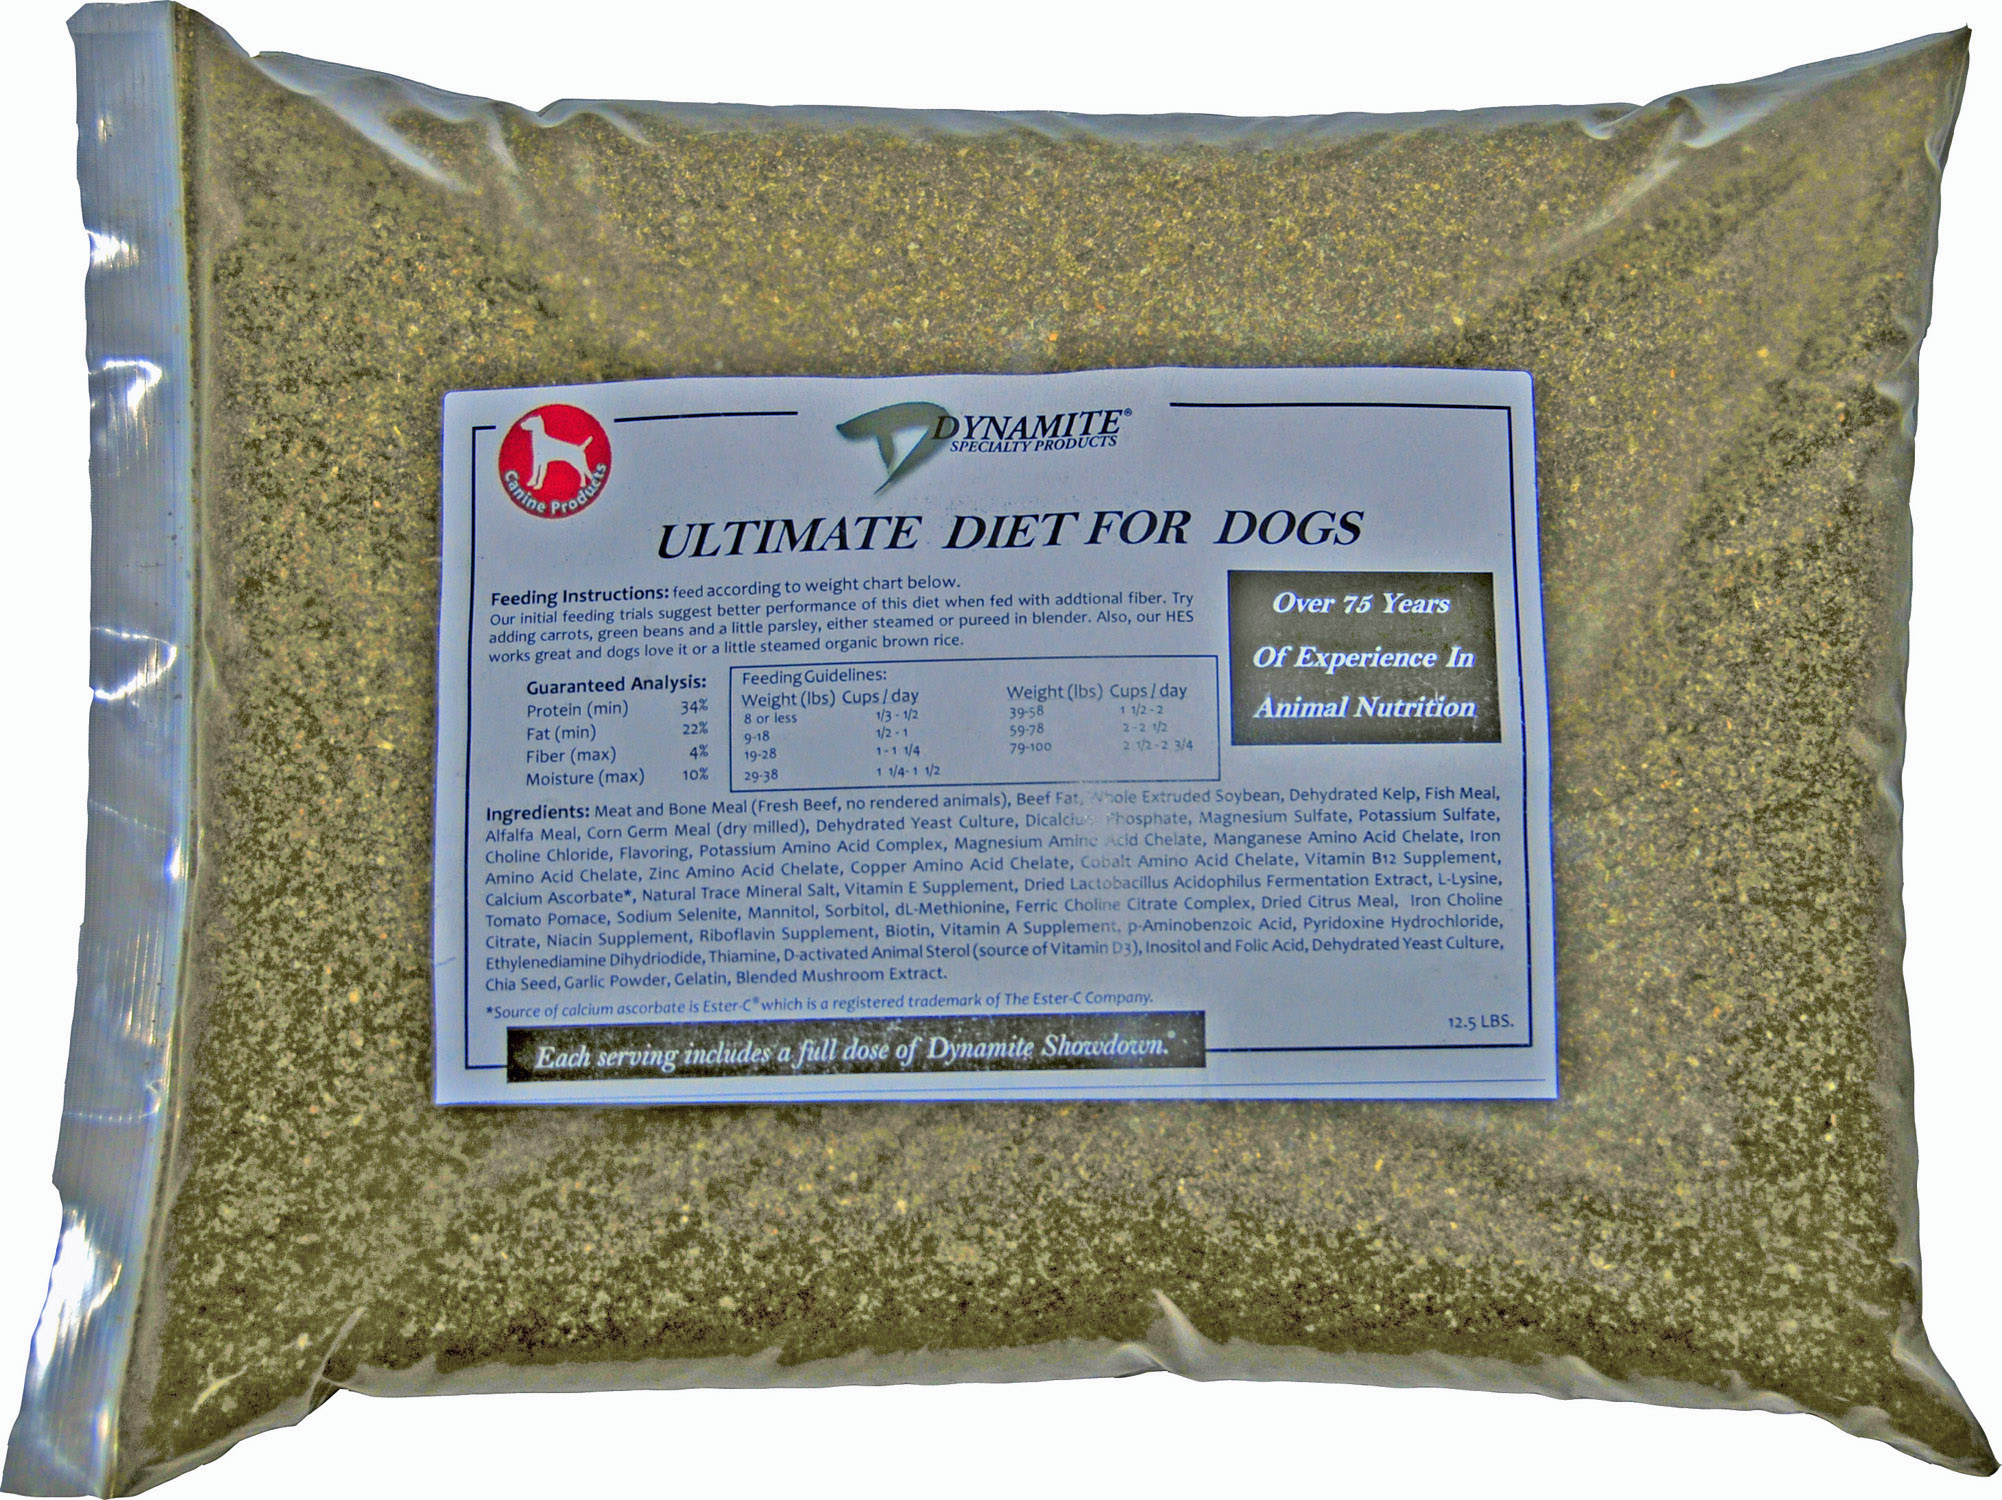 Dynamite Ultimate Dog Food